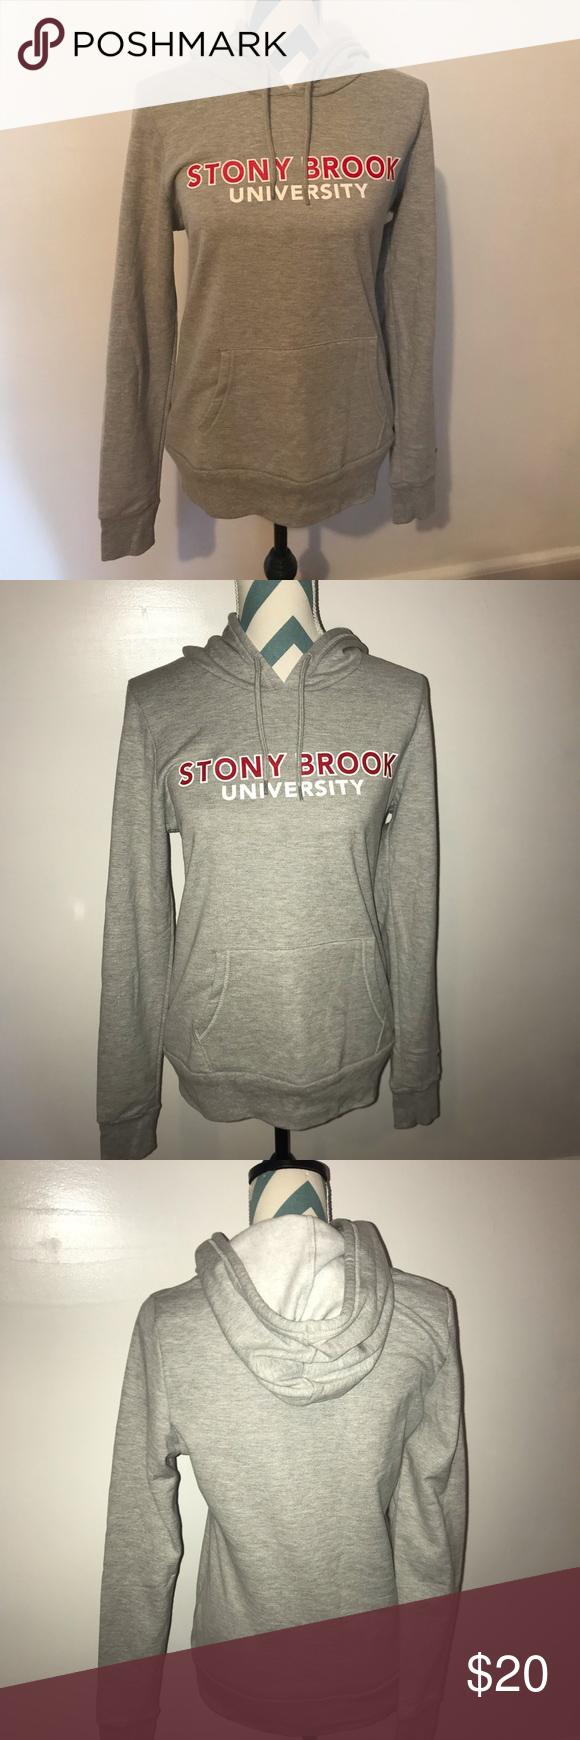 Stony Brook University Champion Sweatshirt Stony Brook University Women S Hooded Sweatshirt Fit Athletic Fabric 57 Champion Sweatshirt Fashion Sweatshirts [ 1740 x 580 Pixel ]